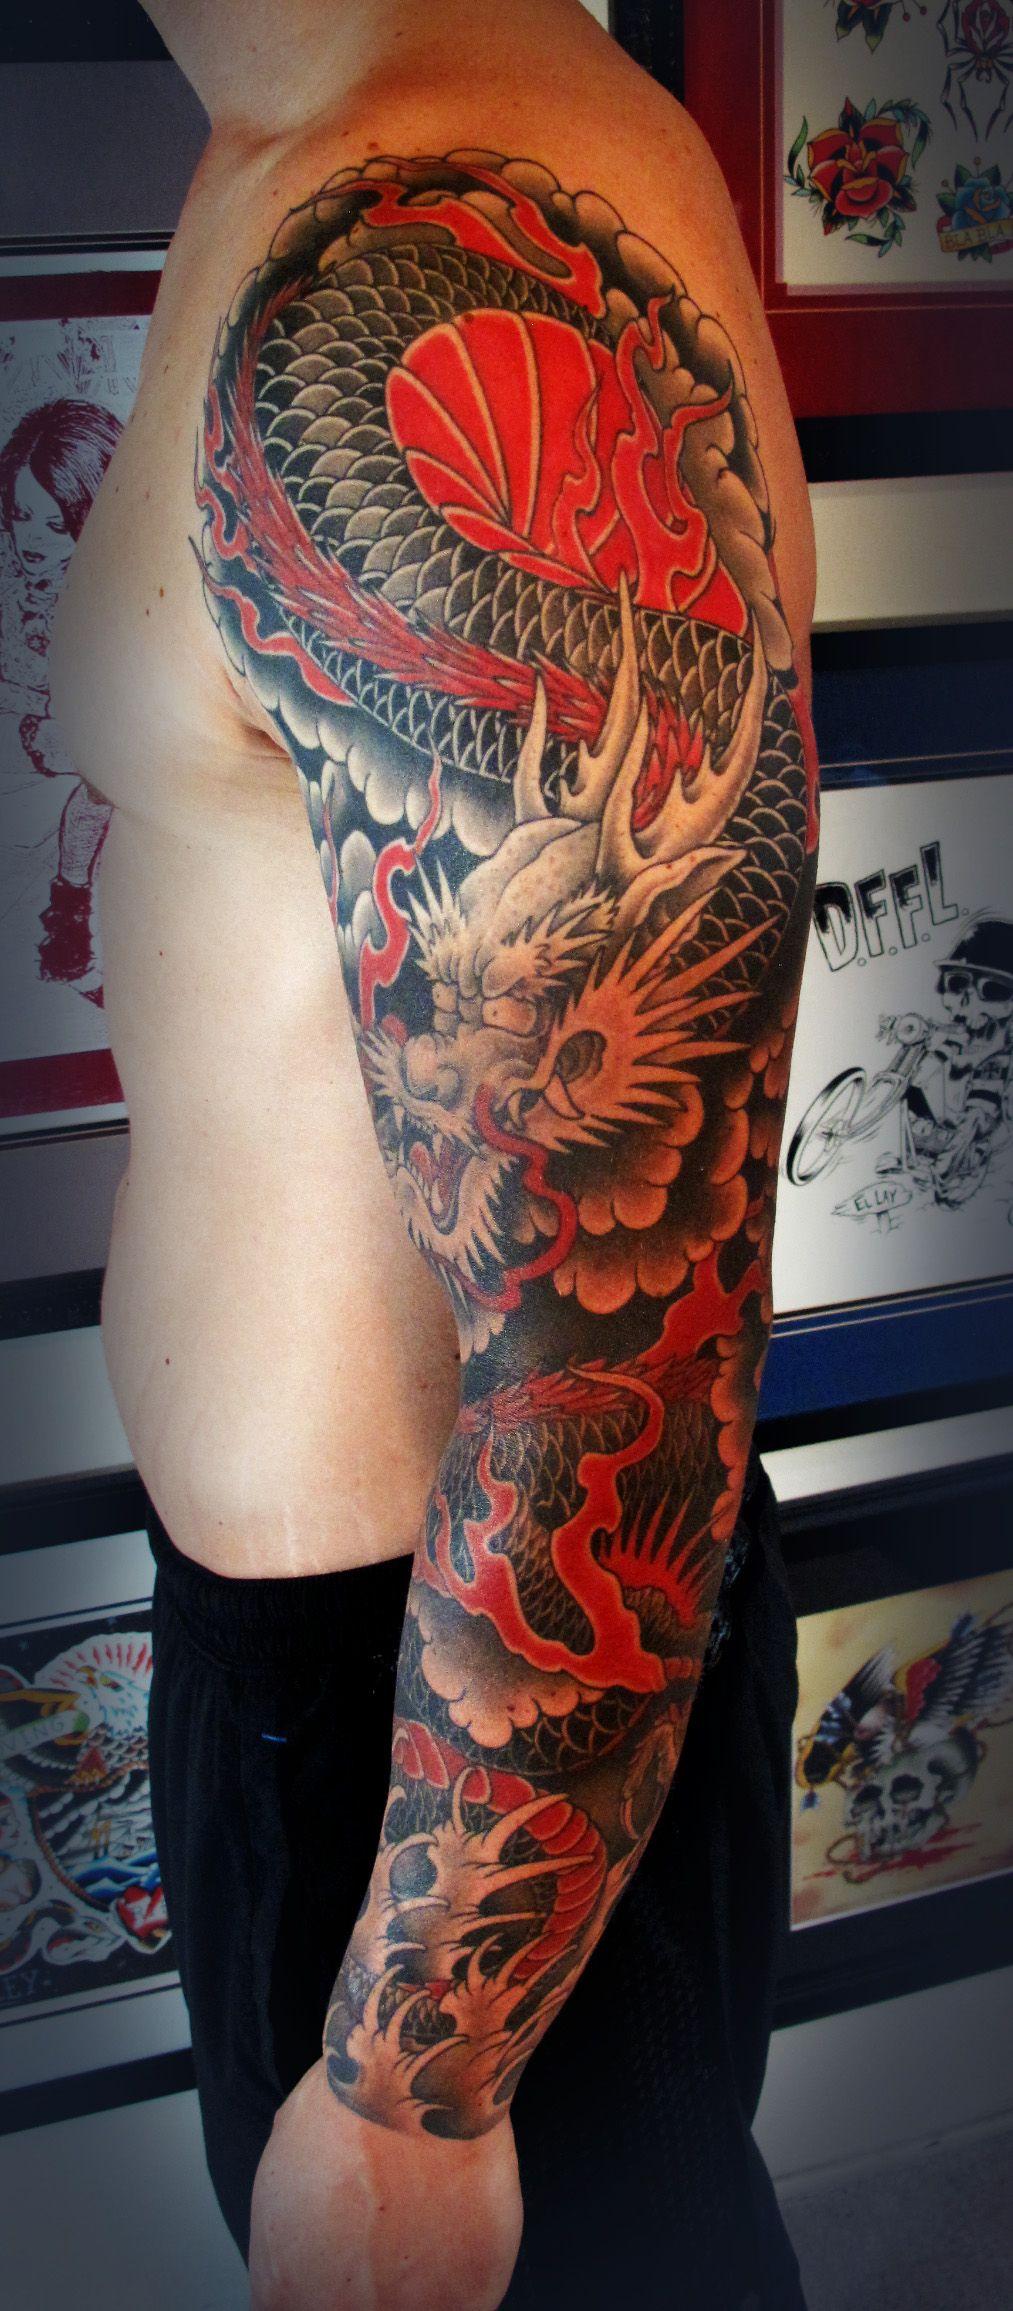 Dragon Sleeve Saltwatertattoo Dragon Sleeve Tattoos Tattoos For Guys Japanese Dragon Tattoos